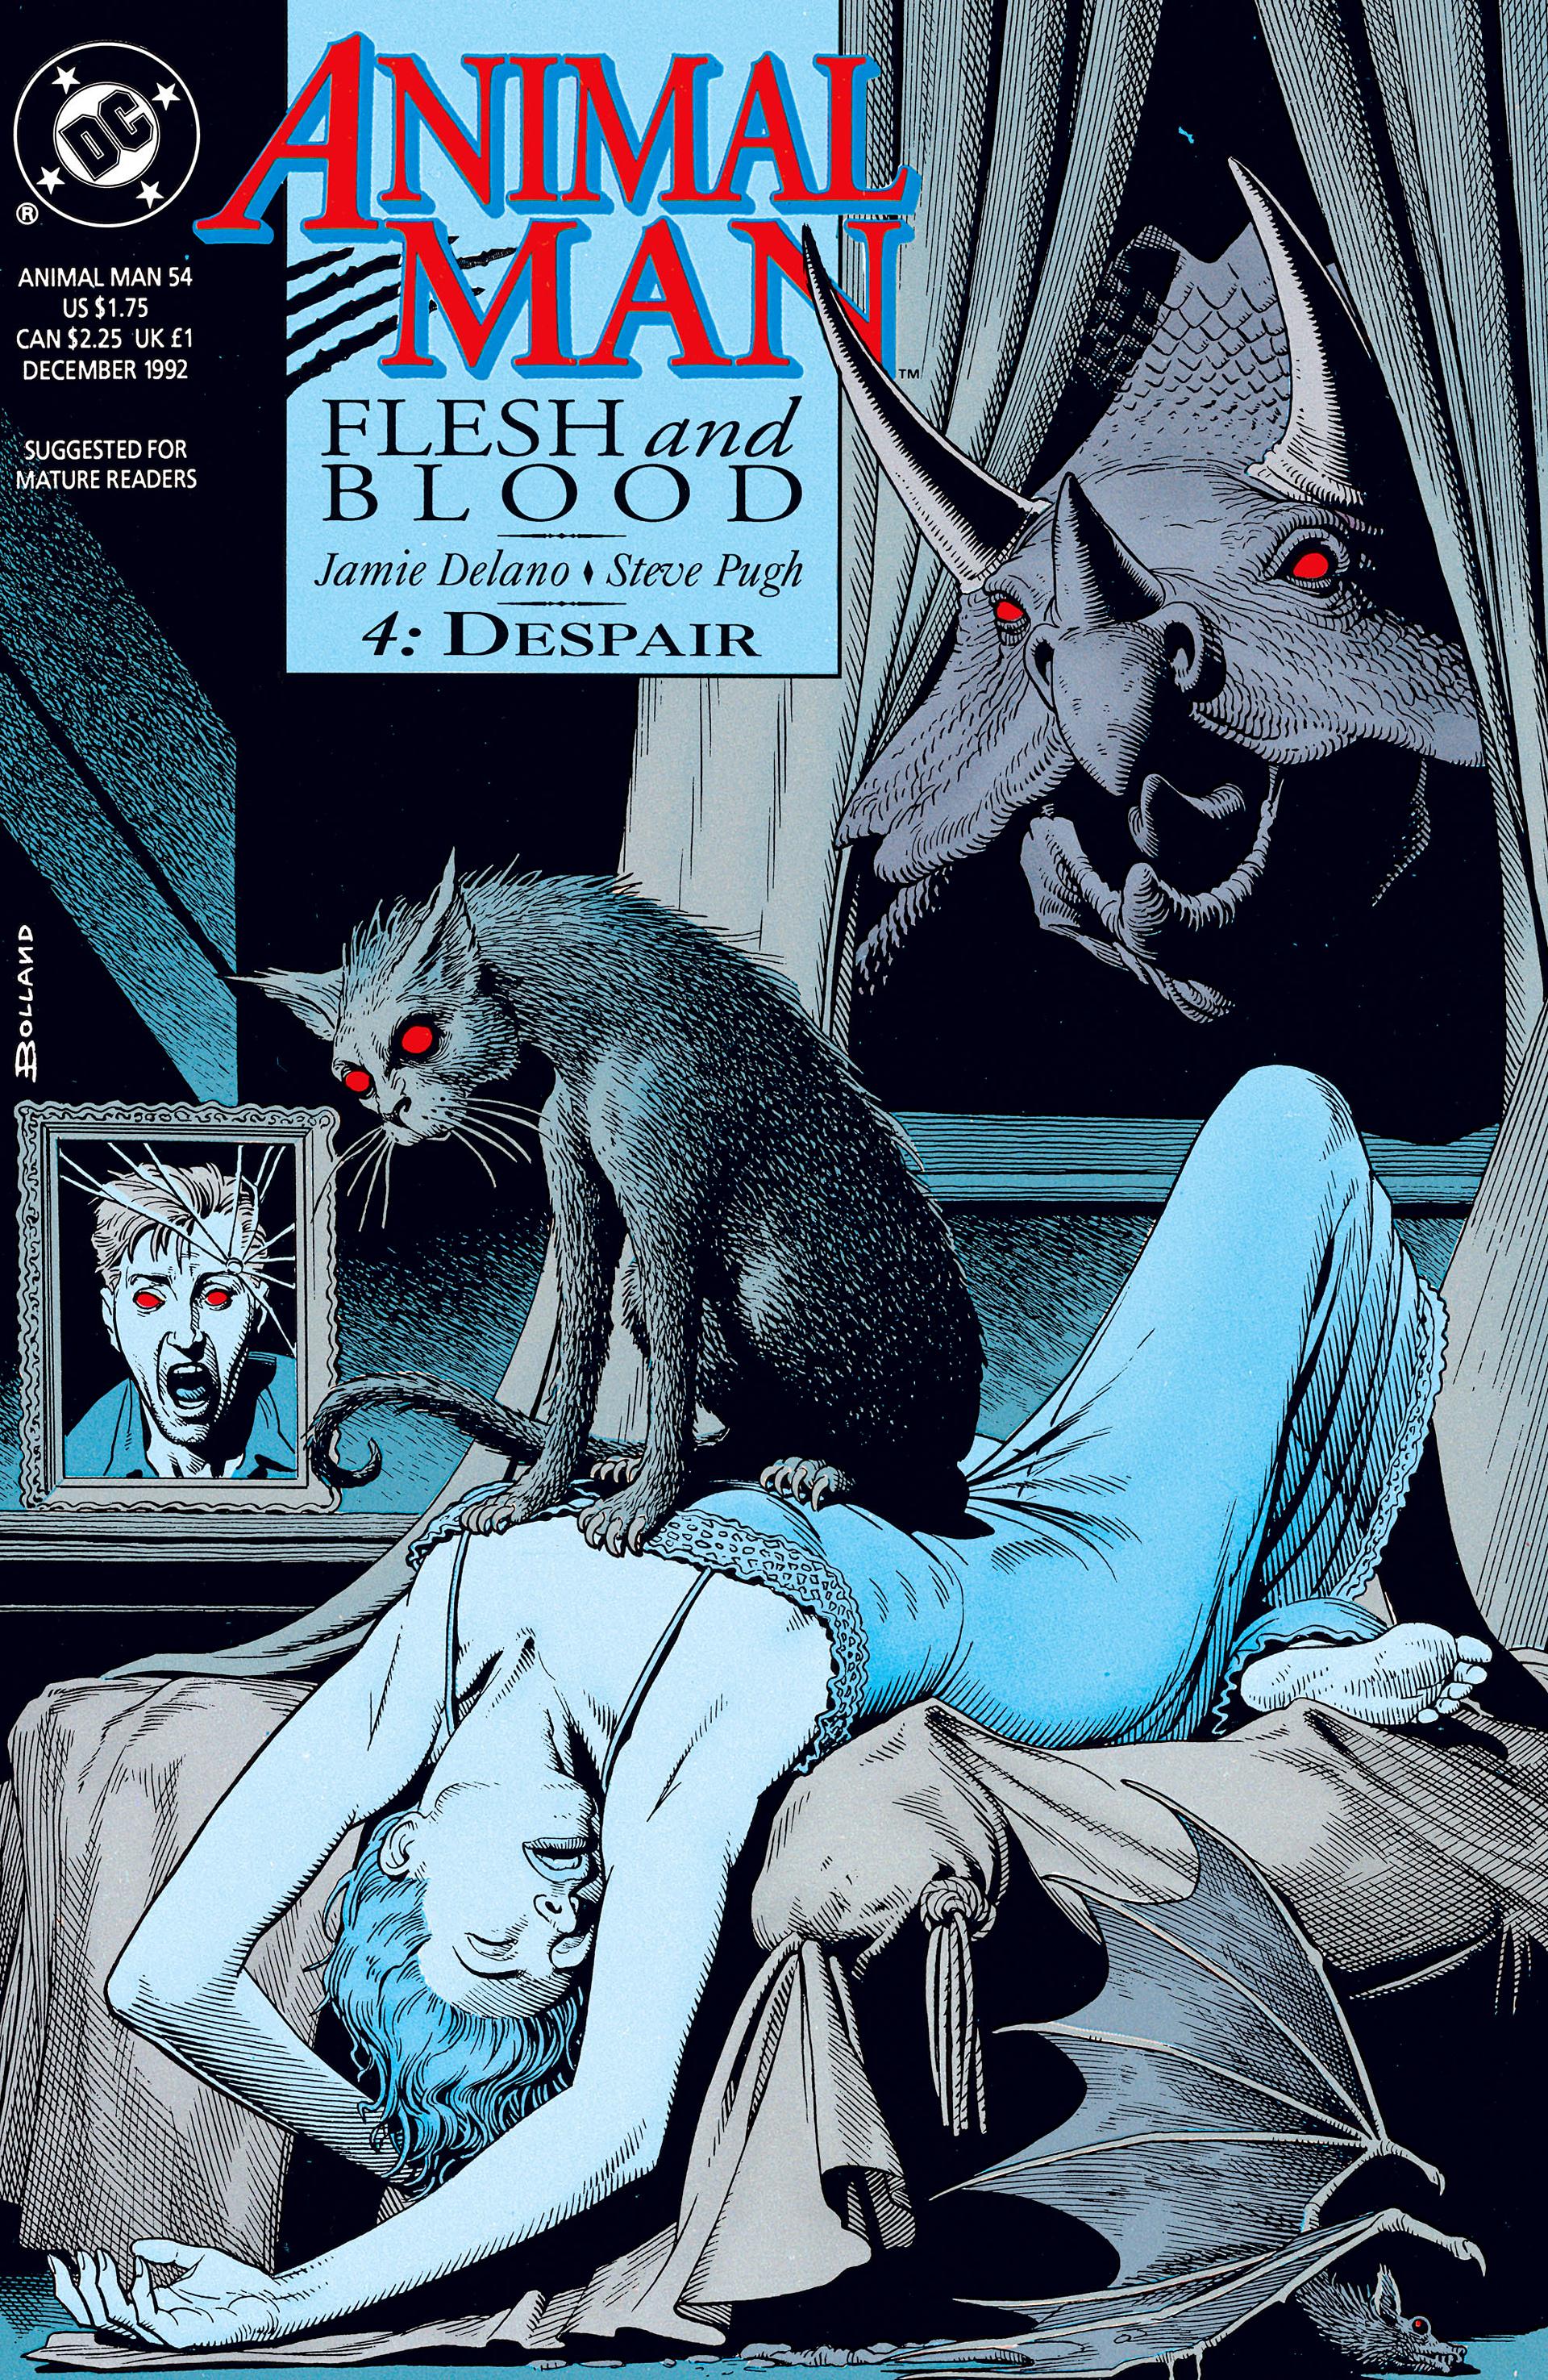 Read online Animal Man (1988) comic -  Issue #54 - 1